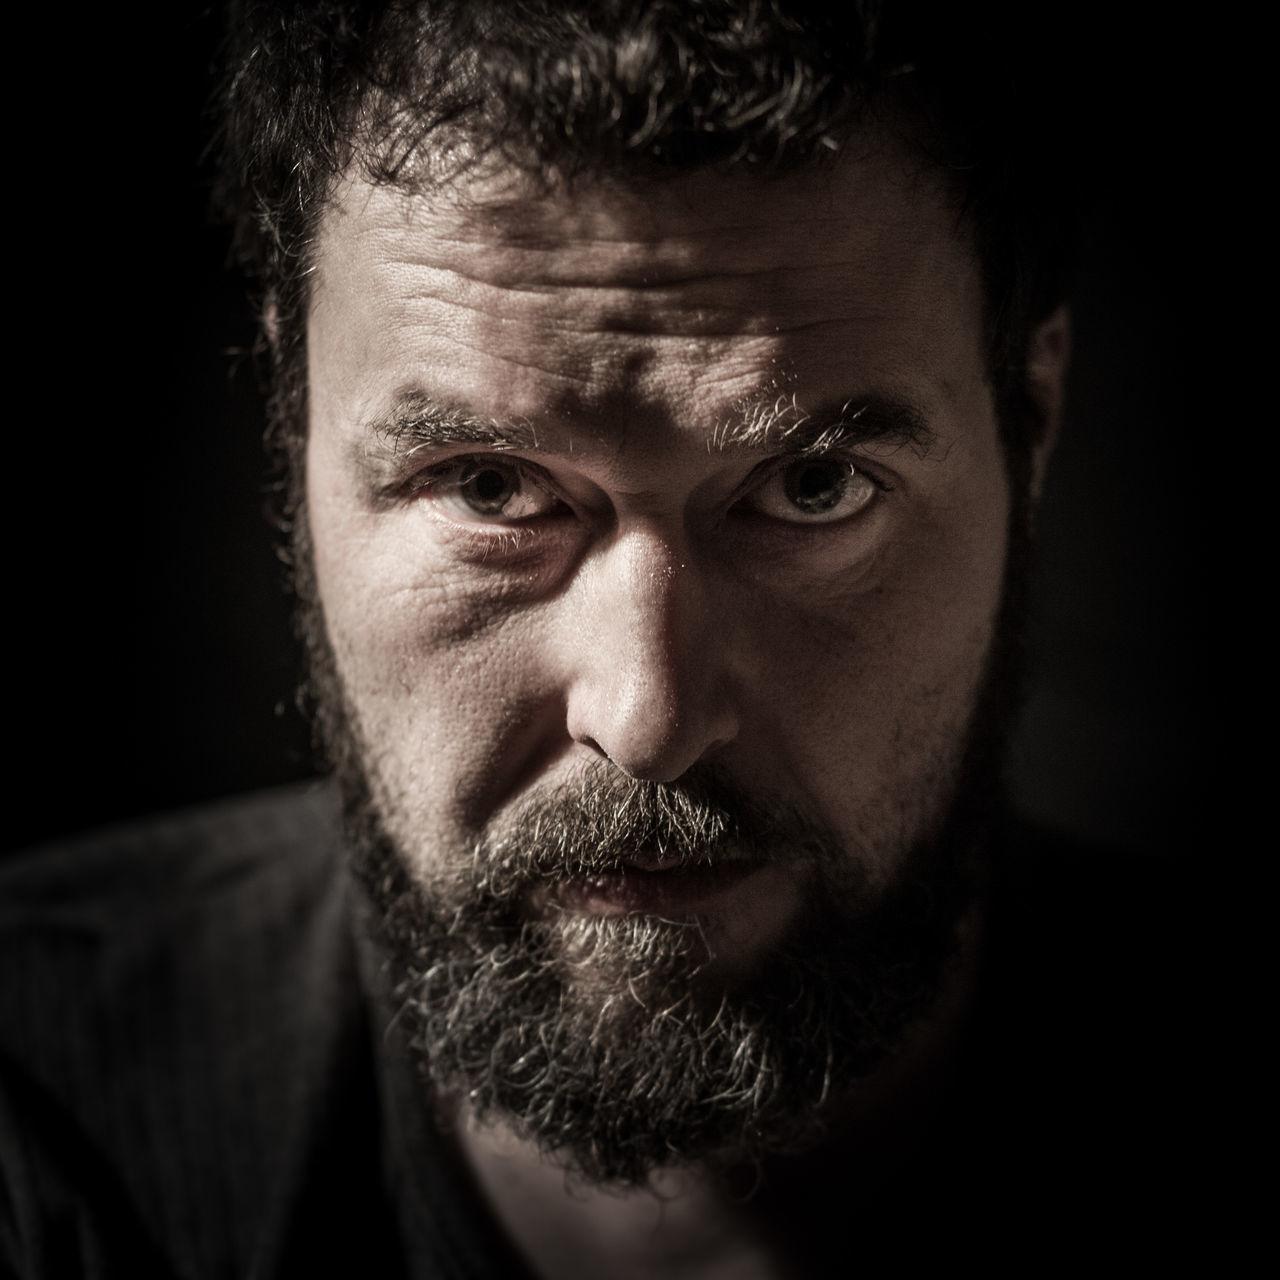 portrait Man beard age mature Raw rough